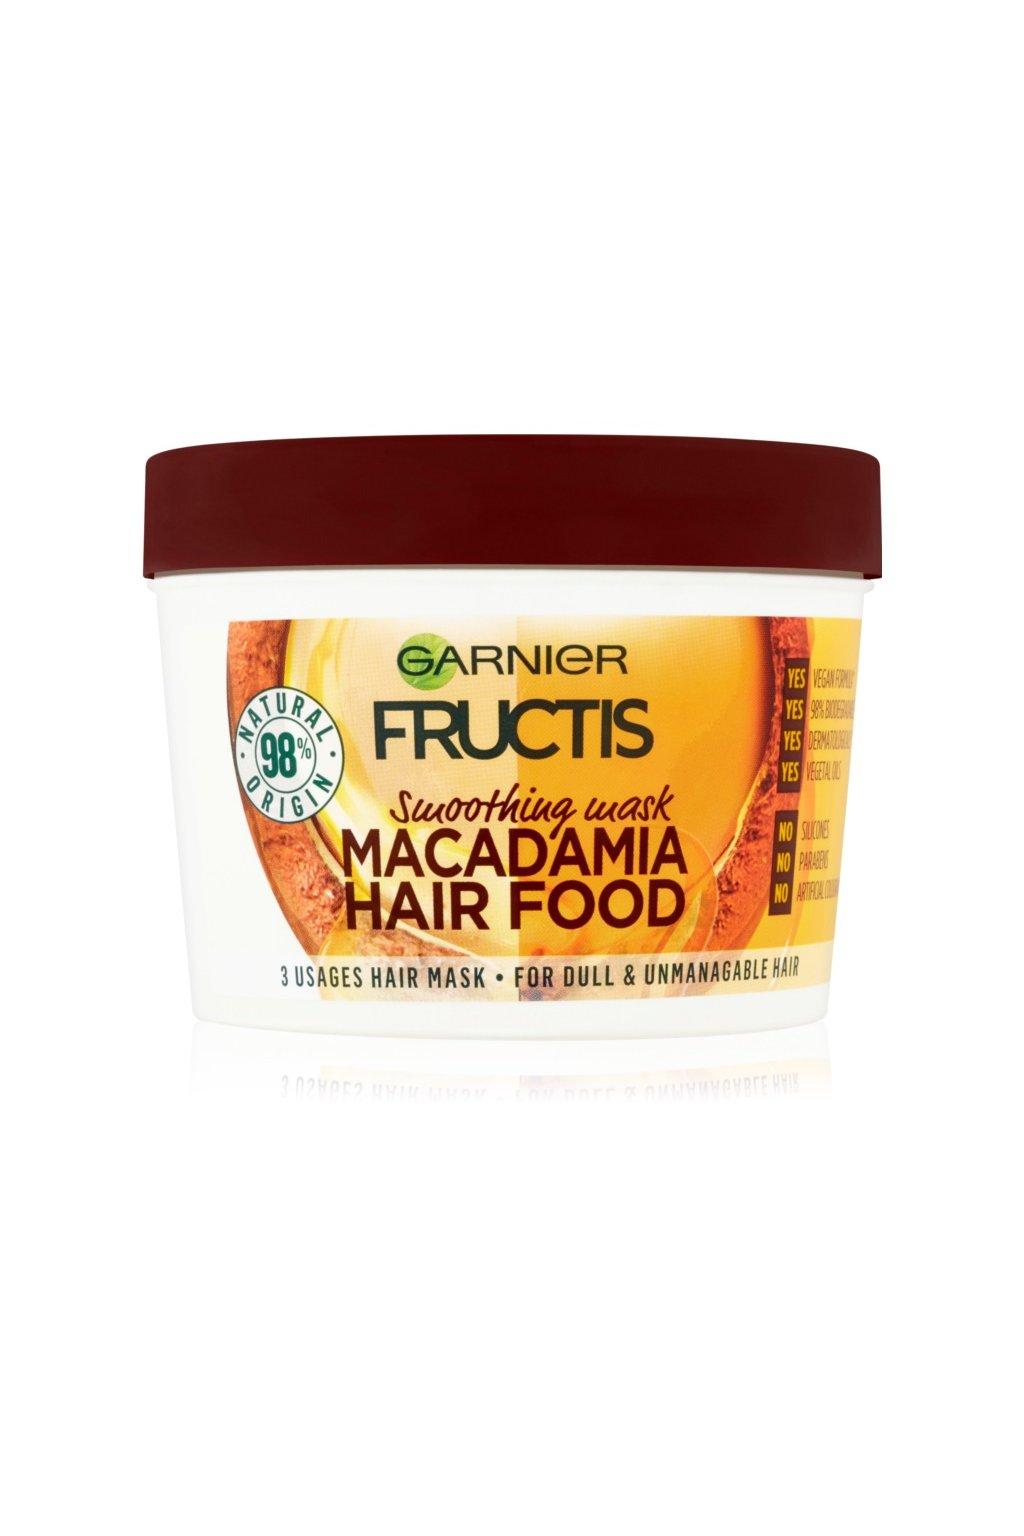 garnier fructis macadamia hair food vyhlazujici maska pro nepoddajne vlasy 5